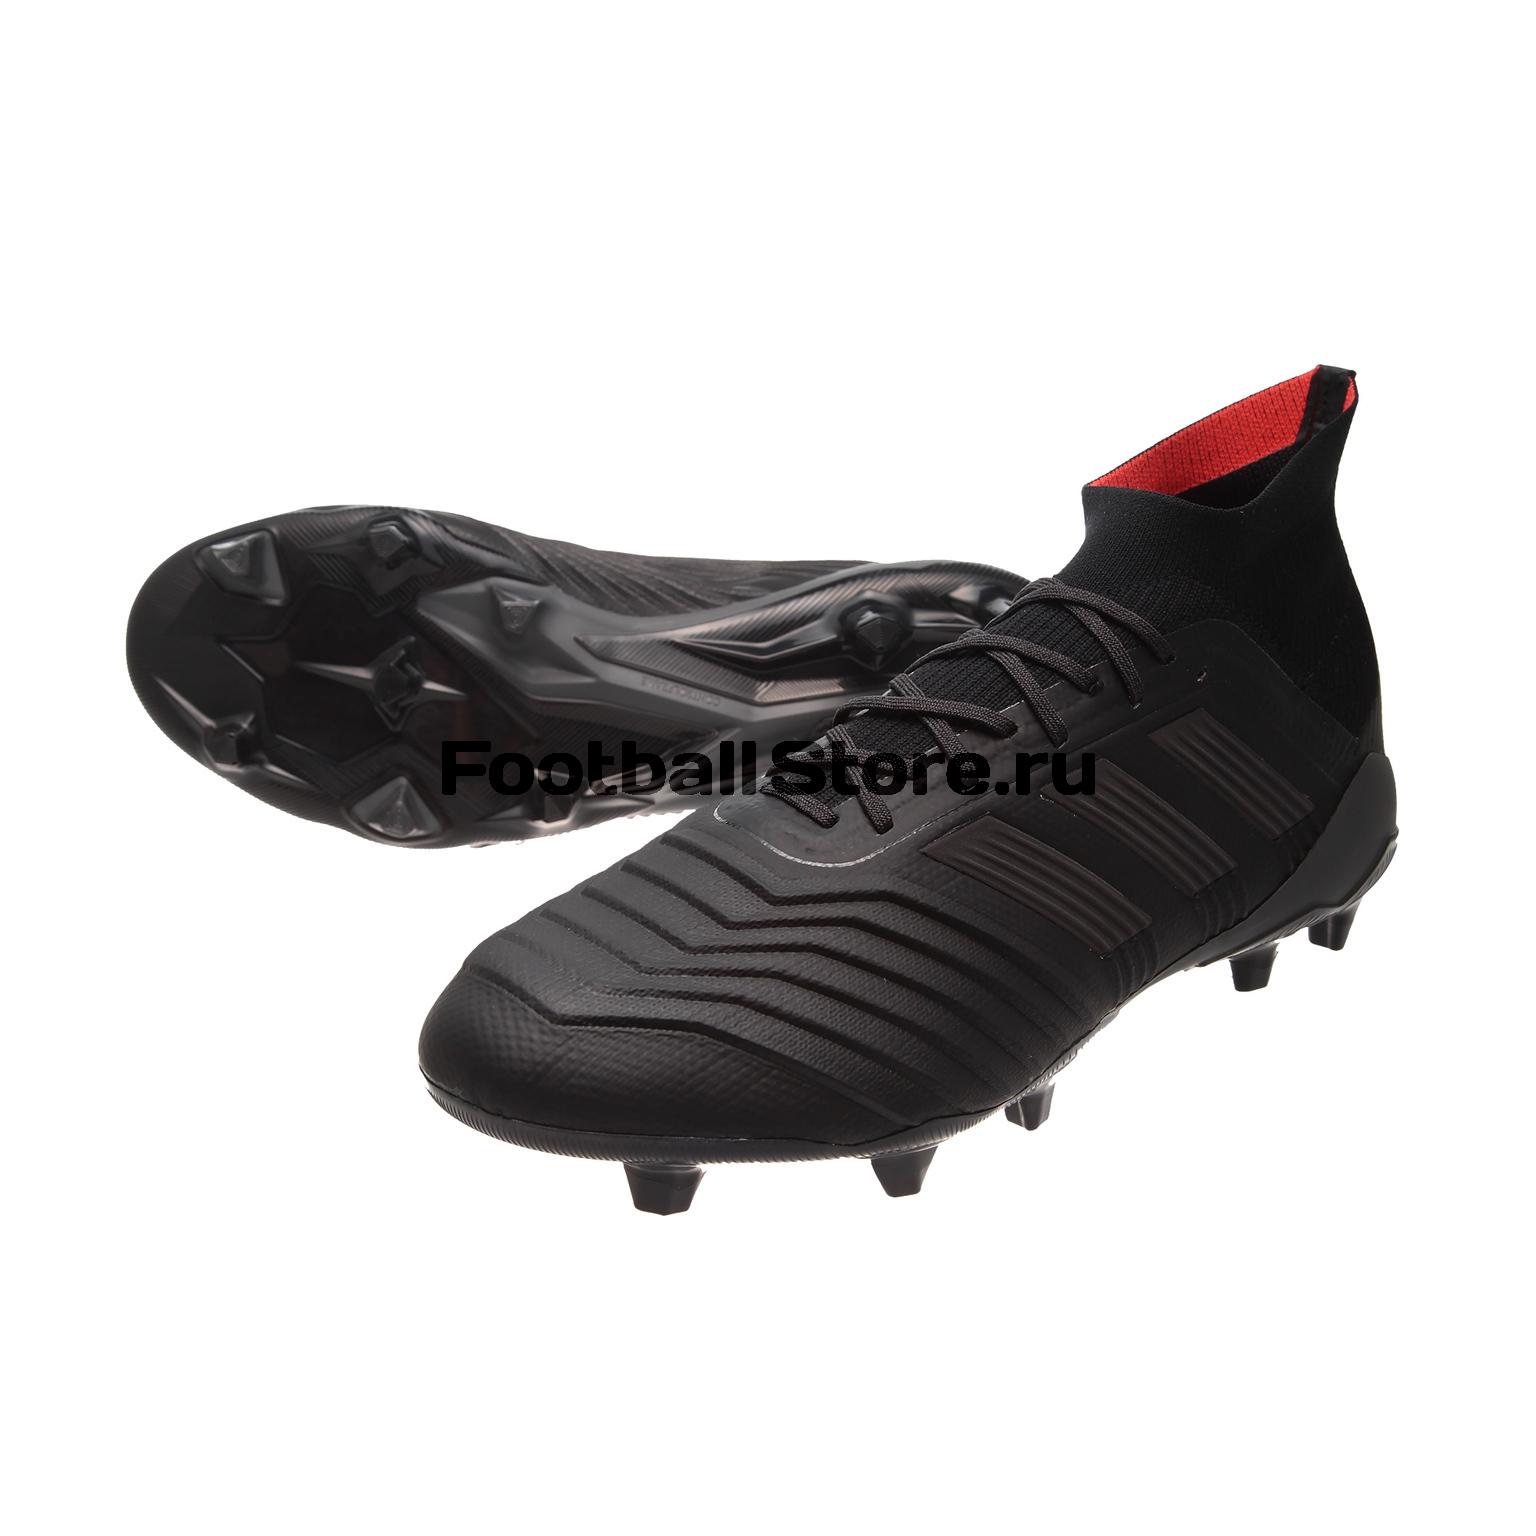 Бутсы Adidas Predator 18.1 FG CM7413 adidas predator junior gk glove